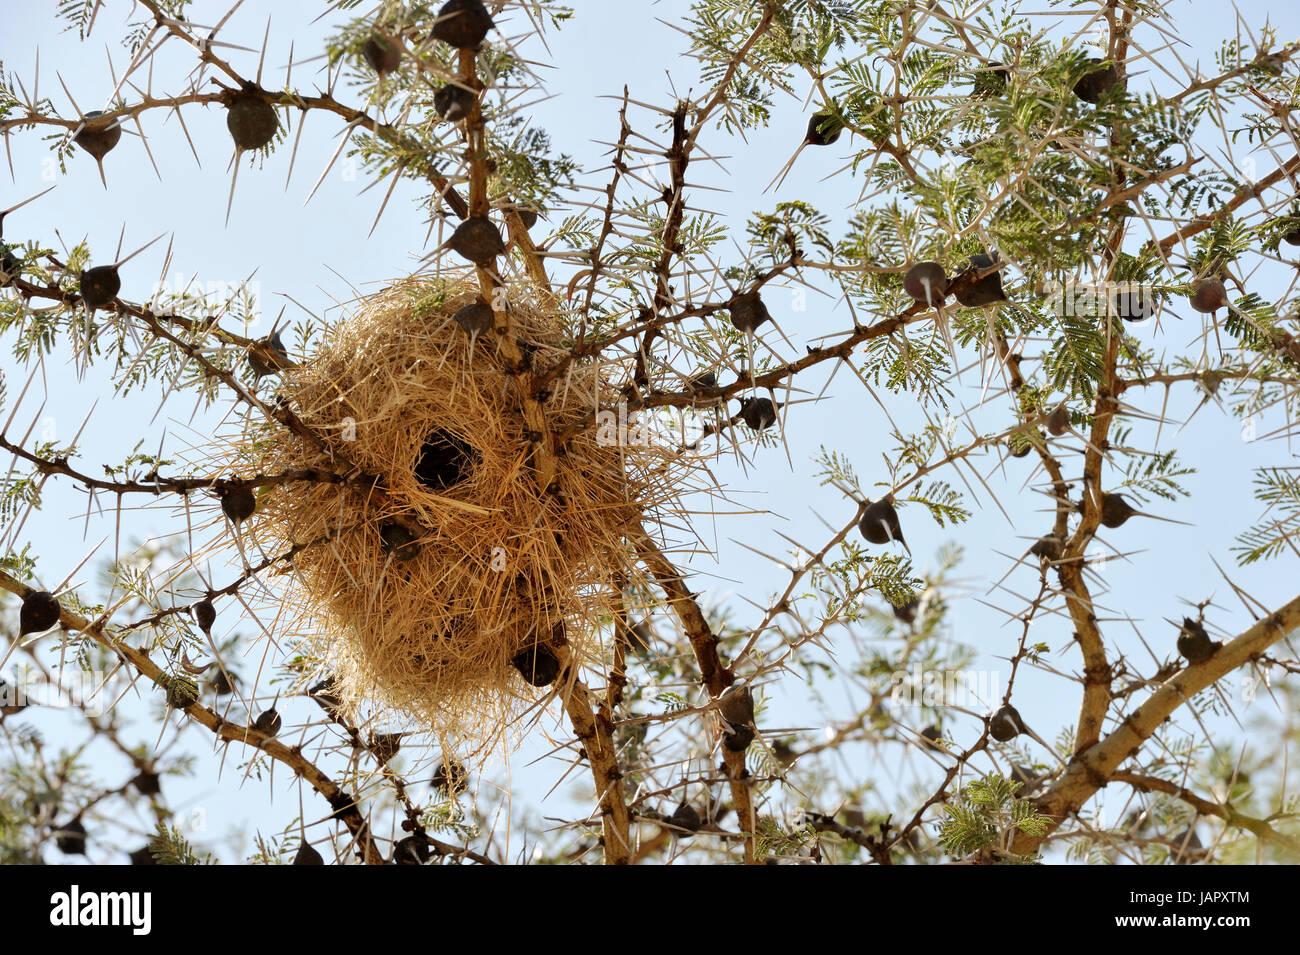 Silbido espinos (Acacia acacia drepanolobium) cerrar con wevers birdnest, típico para el corredor occidental Imagen De Stock